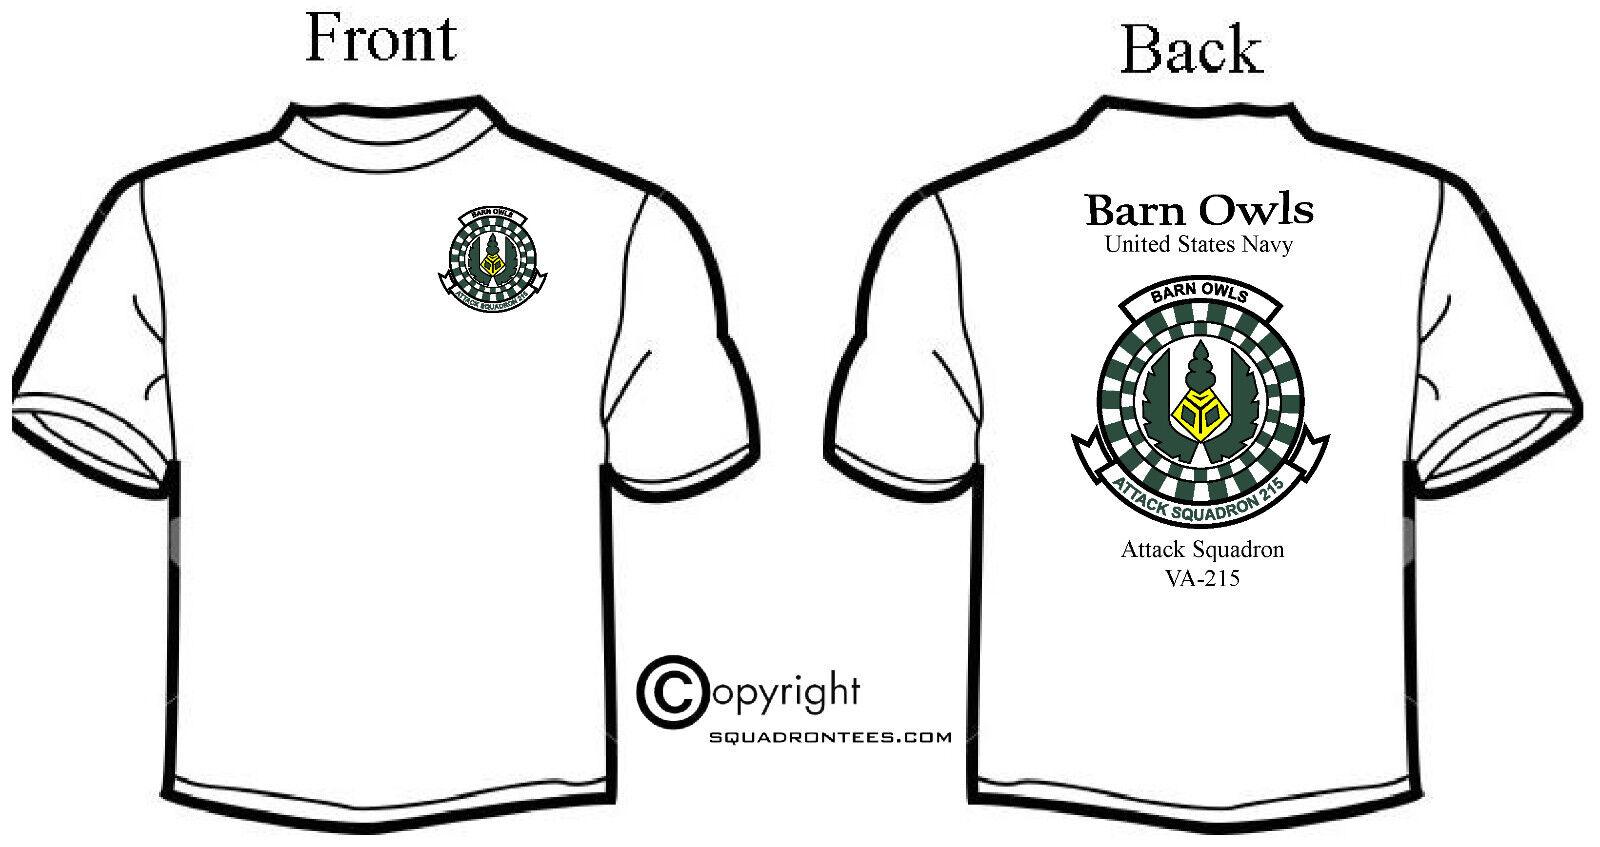 USN VA-215 Barn Owls Squadron Logo T-Shirt, Hoodie, Hat, and Polo